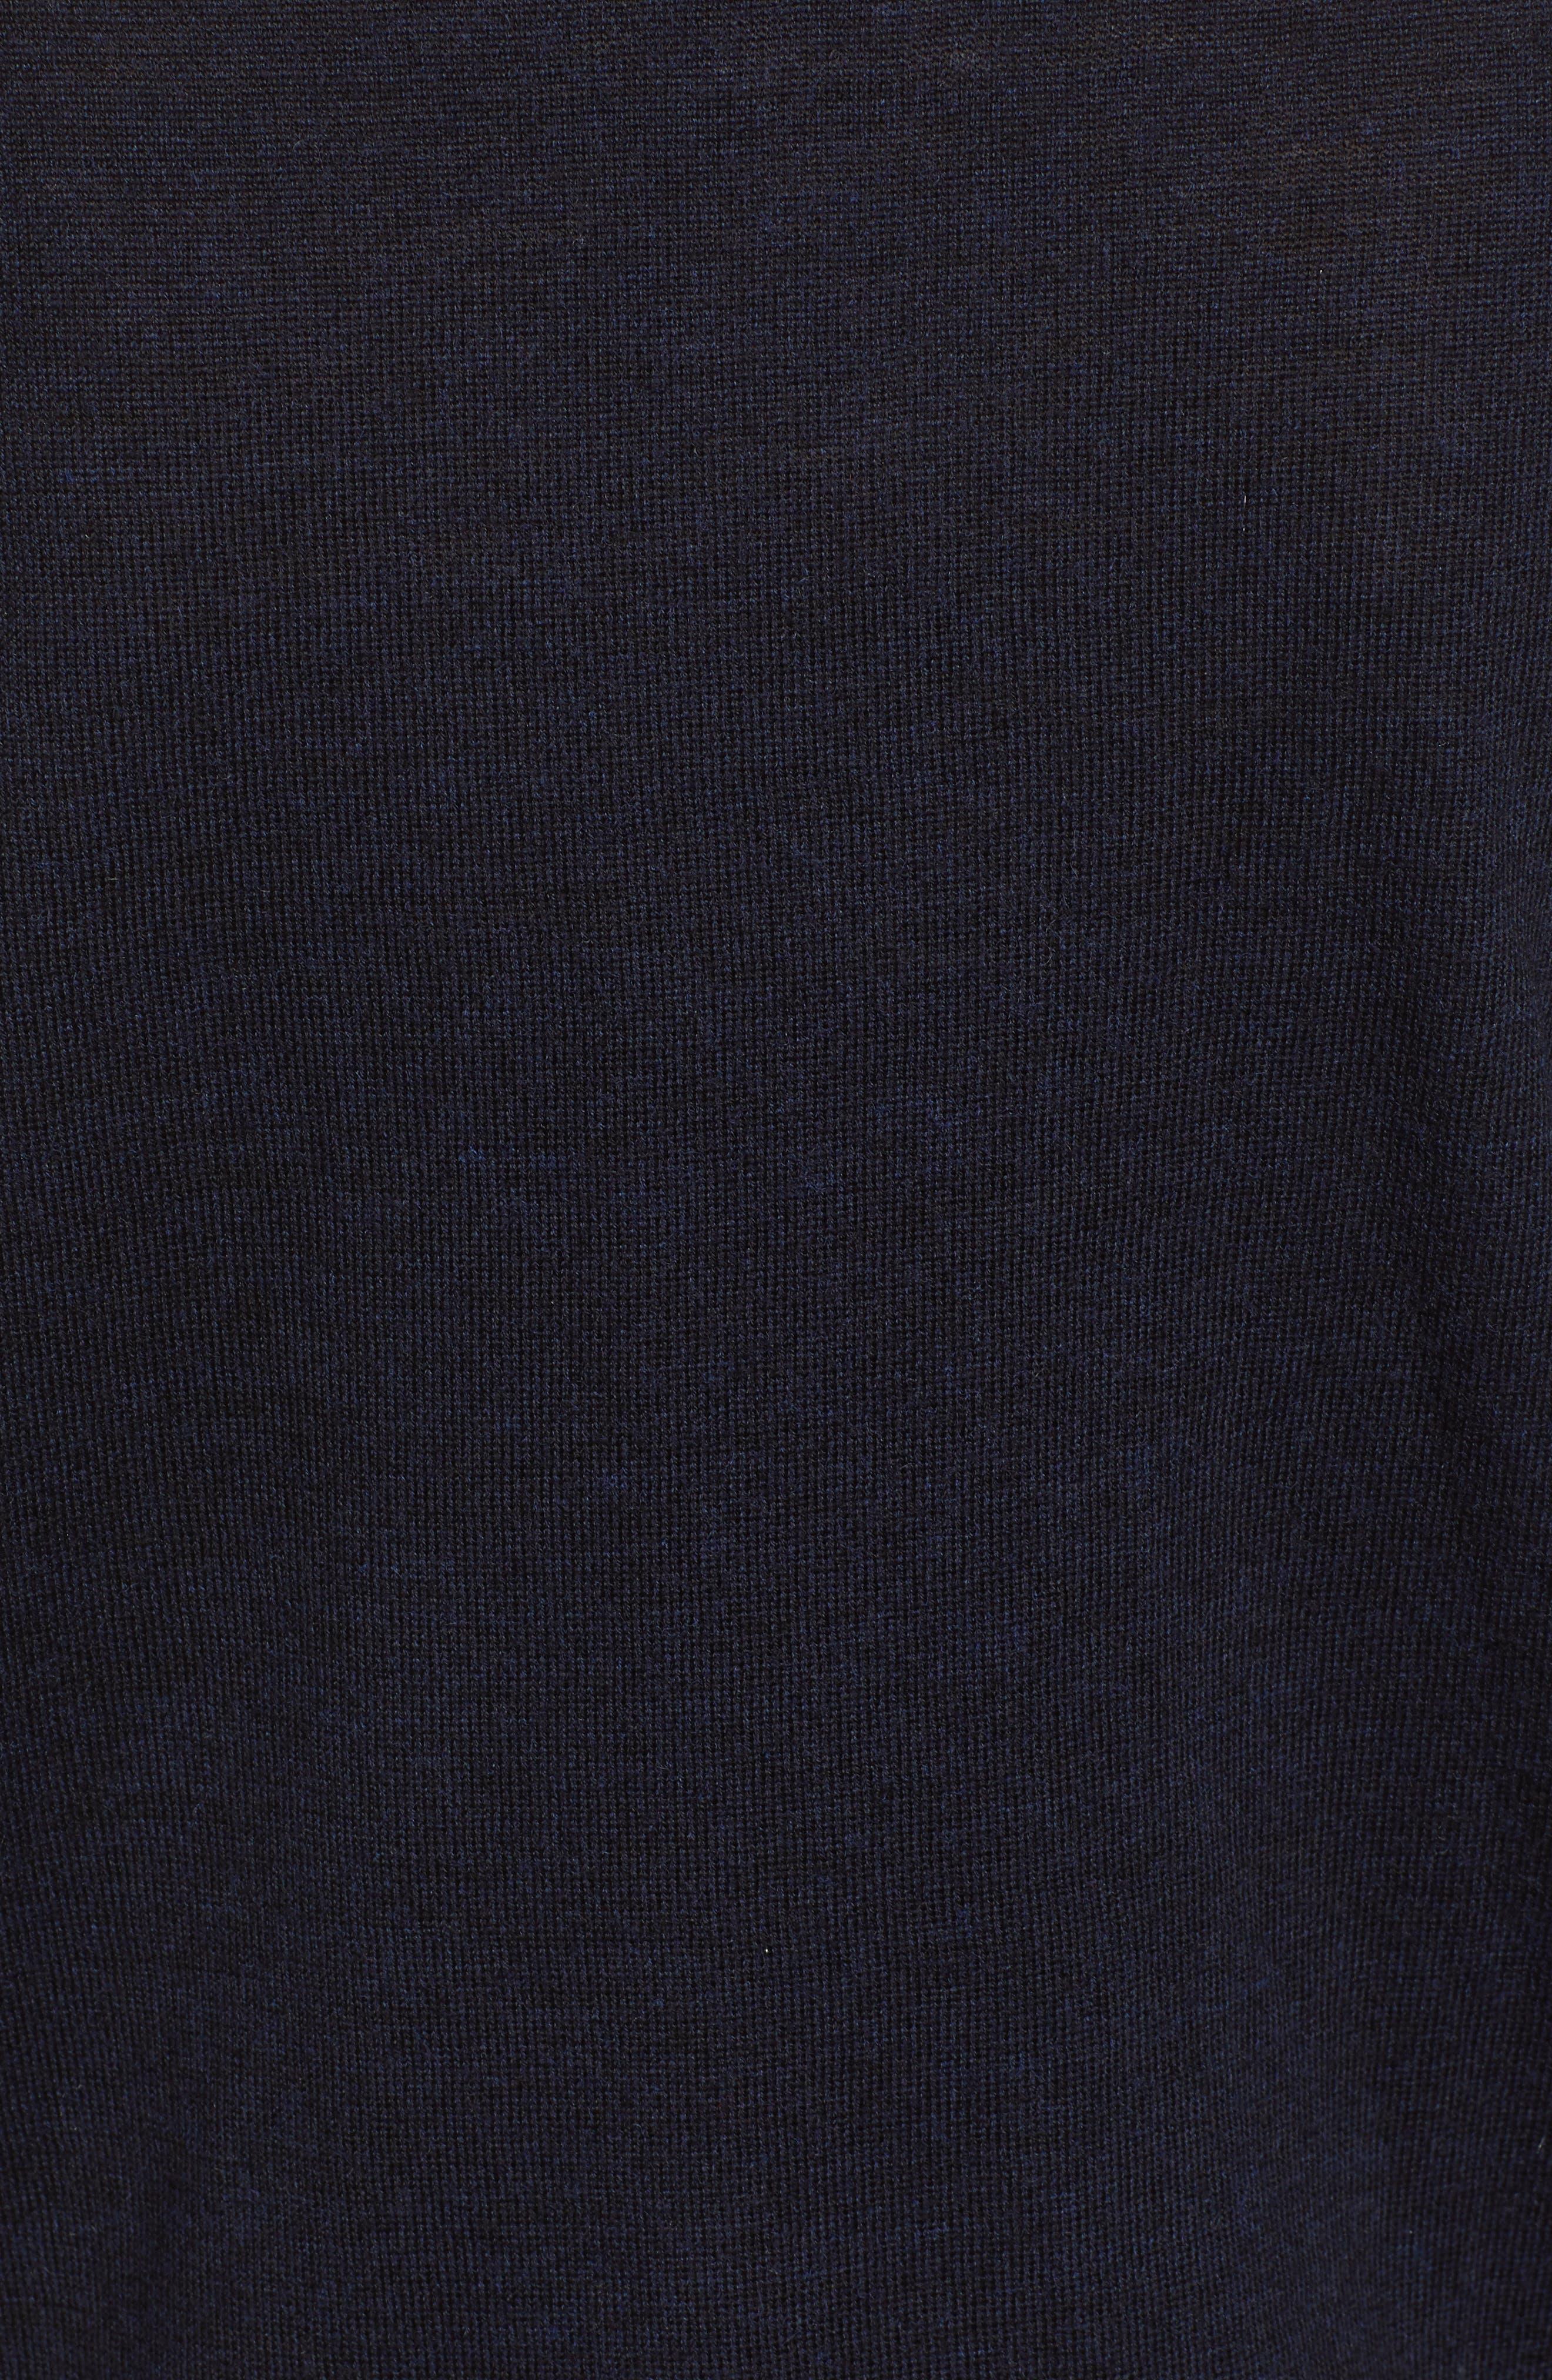 Gwendal Bis Wool Sweater,                             Alternate thumbnail 5, color,                             008